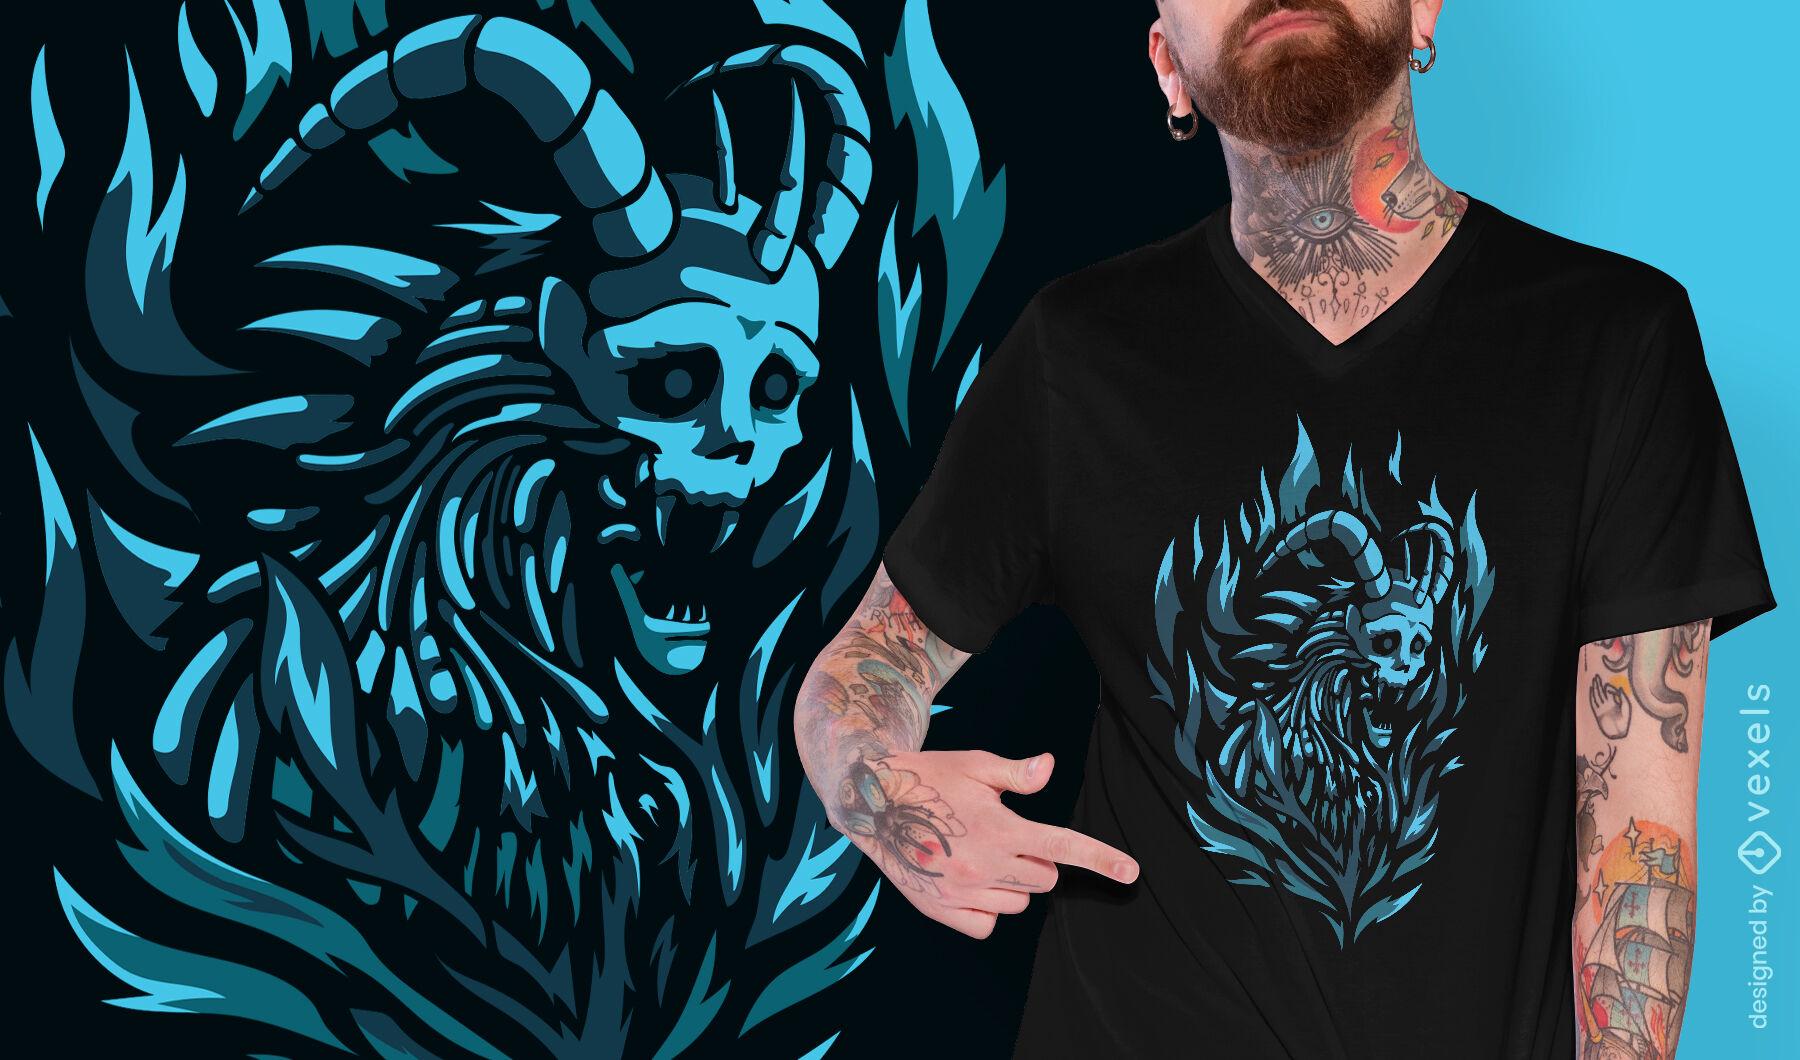 Diseño de camiseta esqueleto demonio criatura oscura